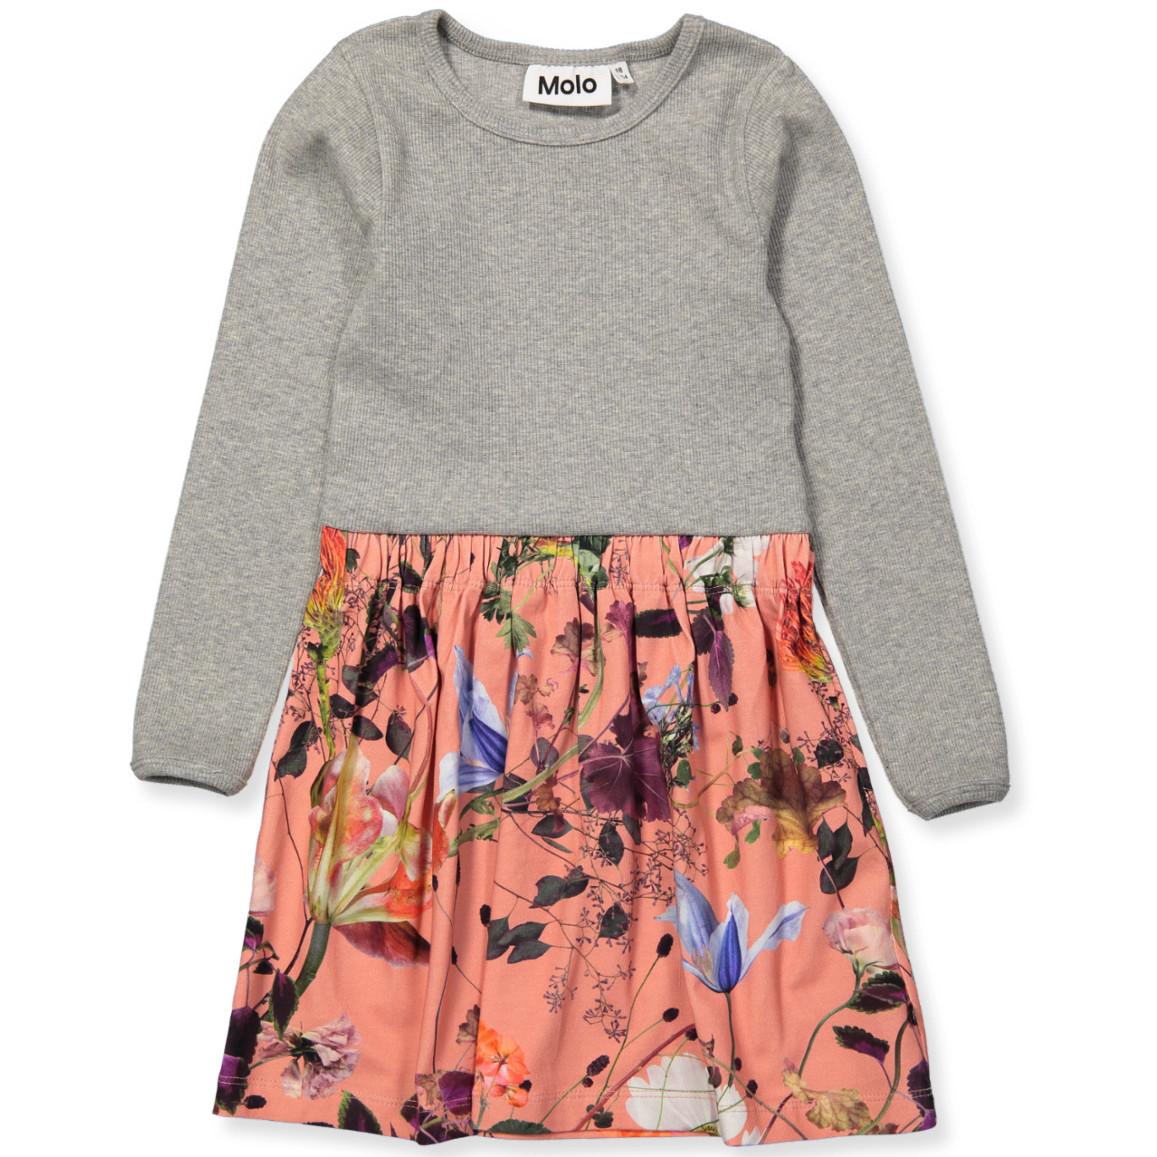 9c06c4c0 Molo - Credence dress - Sunny Funny - Rosa